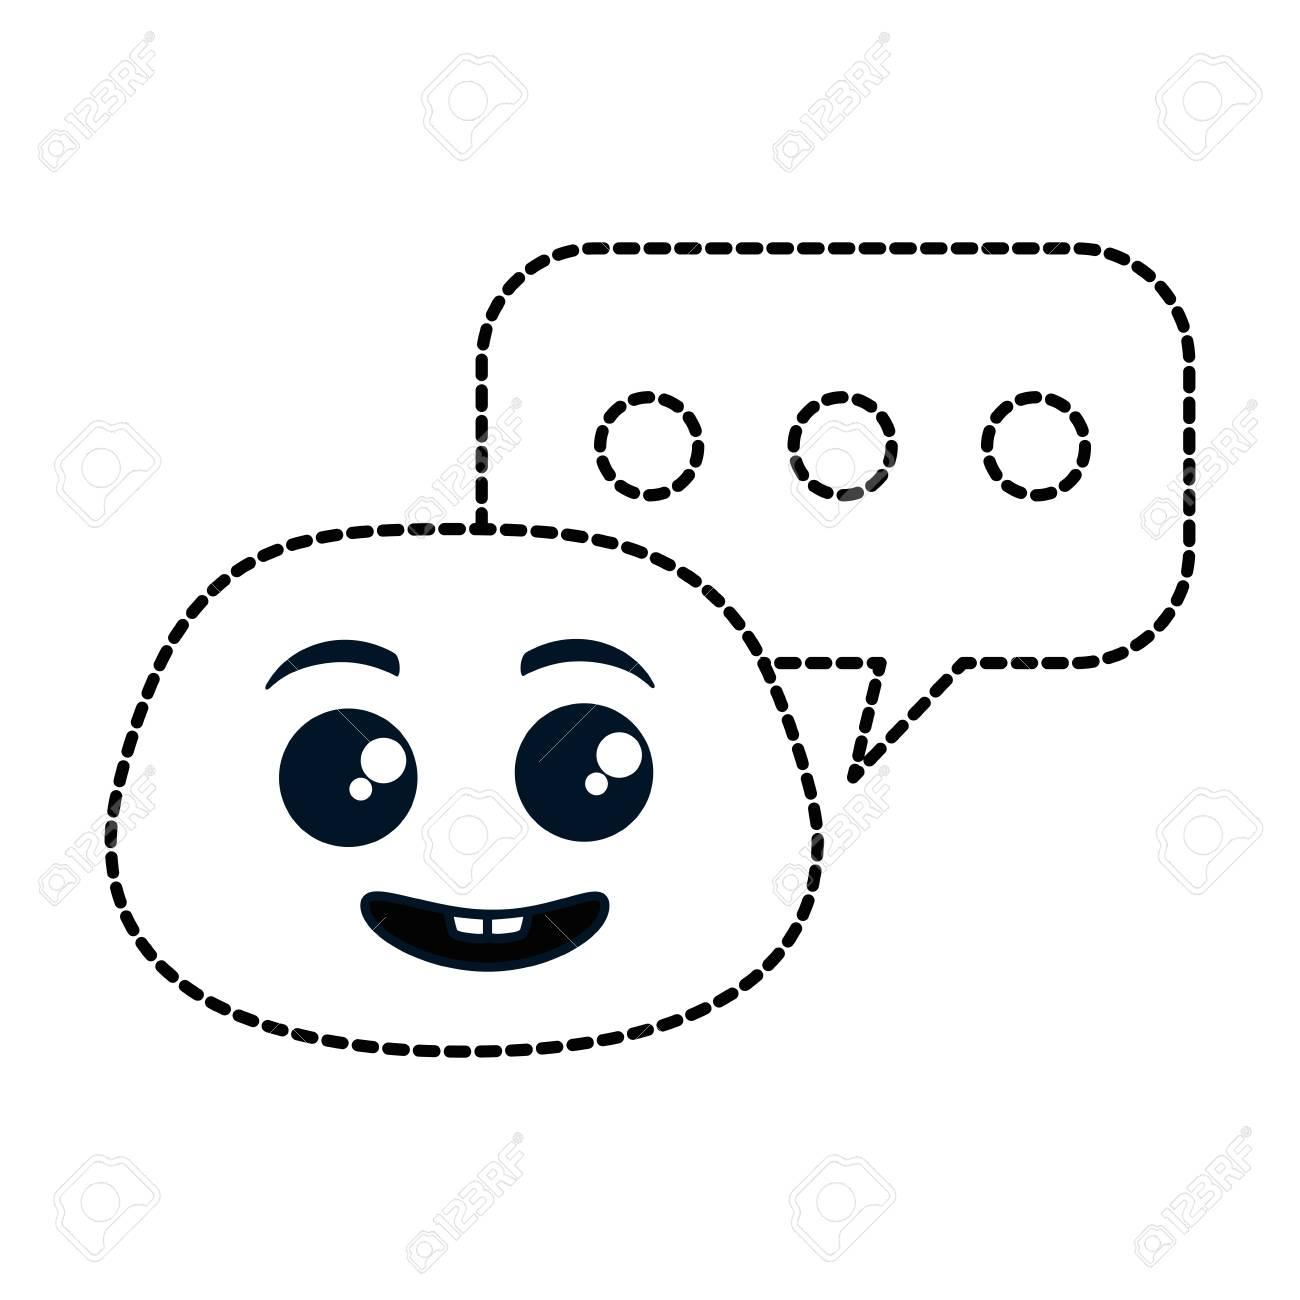 nerd emoji face with speech bubble vector illustration design